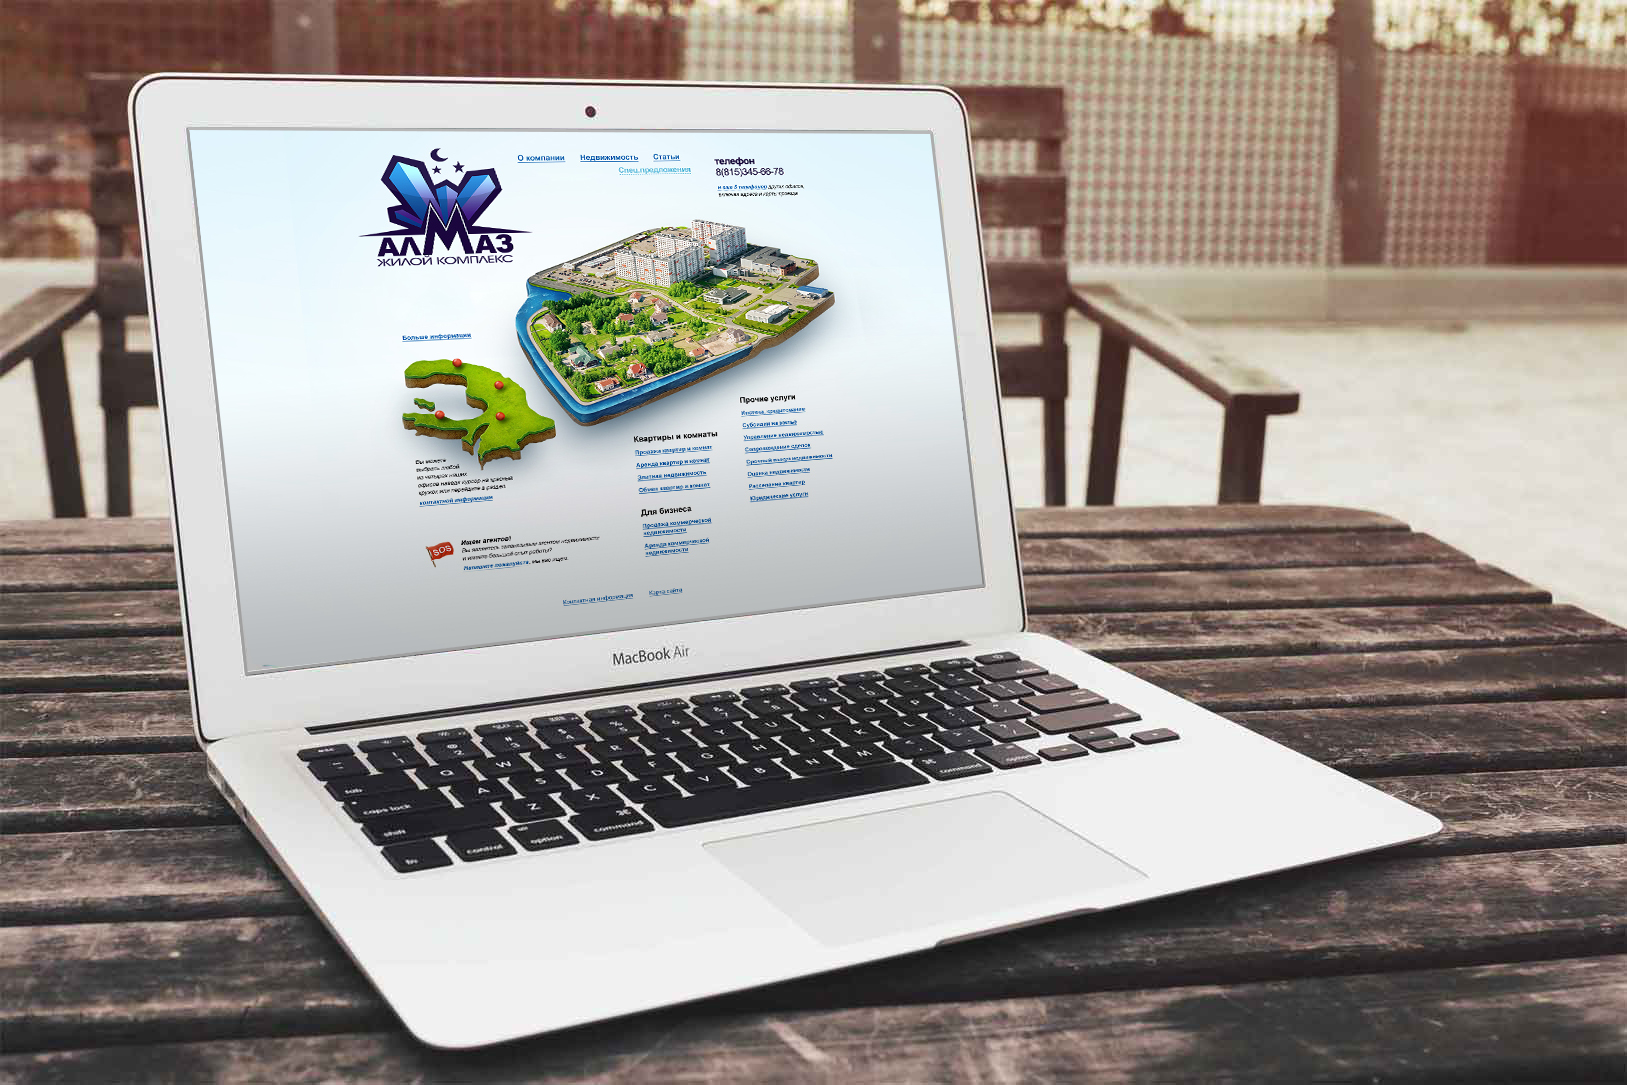 Конкурс на разработку названия и логотипа Жилого комплекса фото f_6705468c0b15f218.jpg